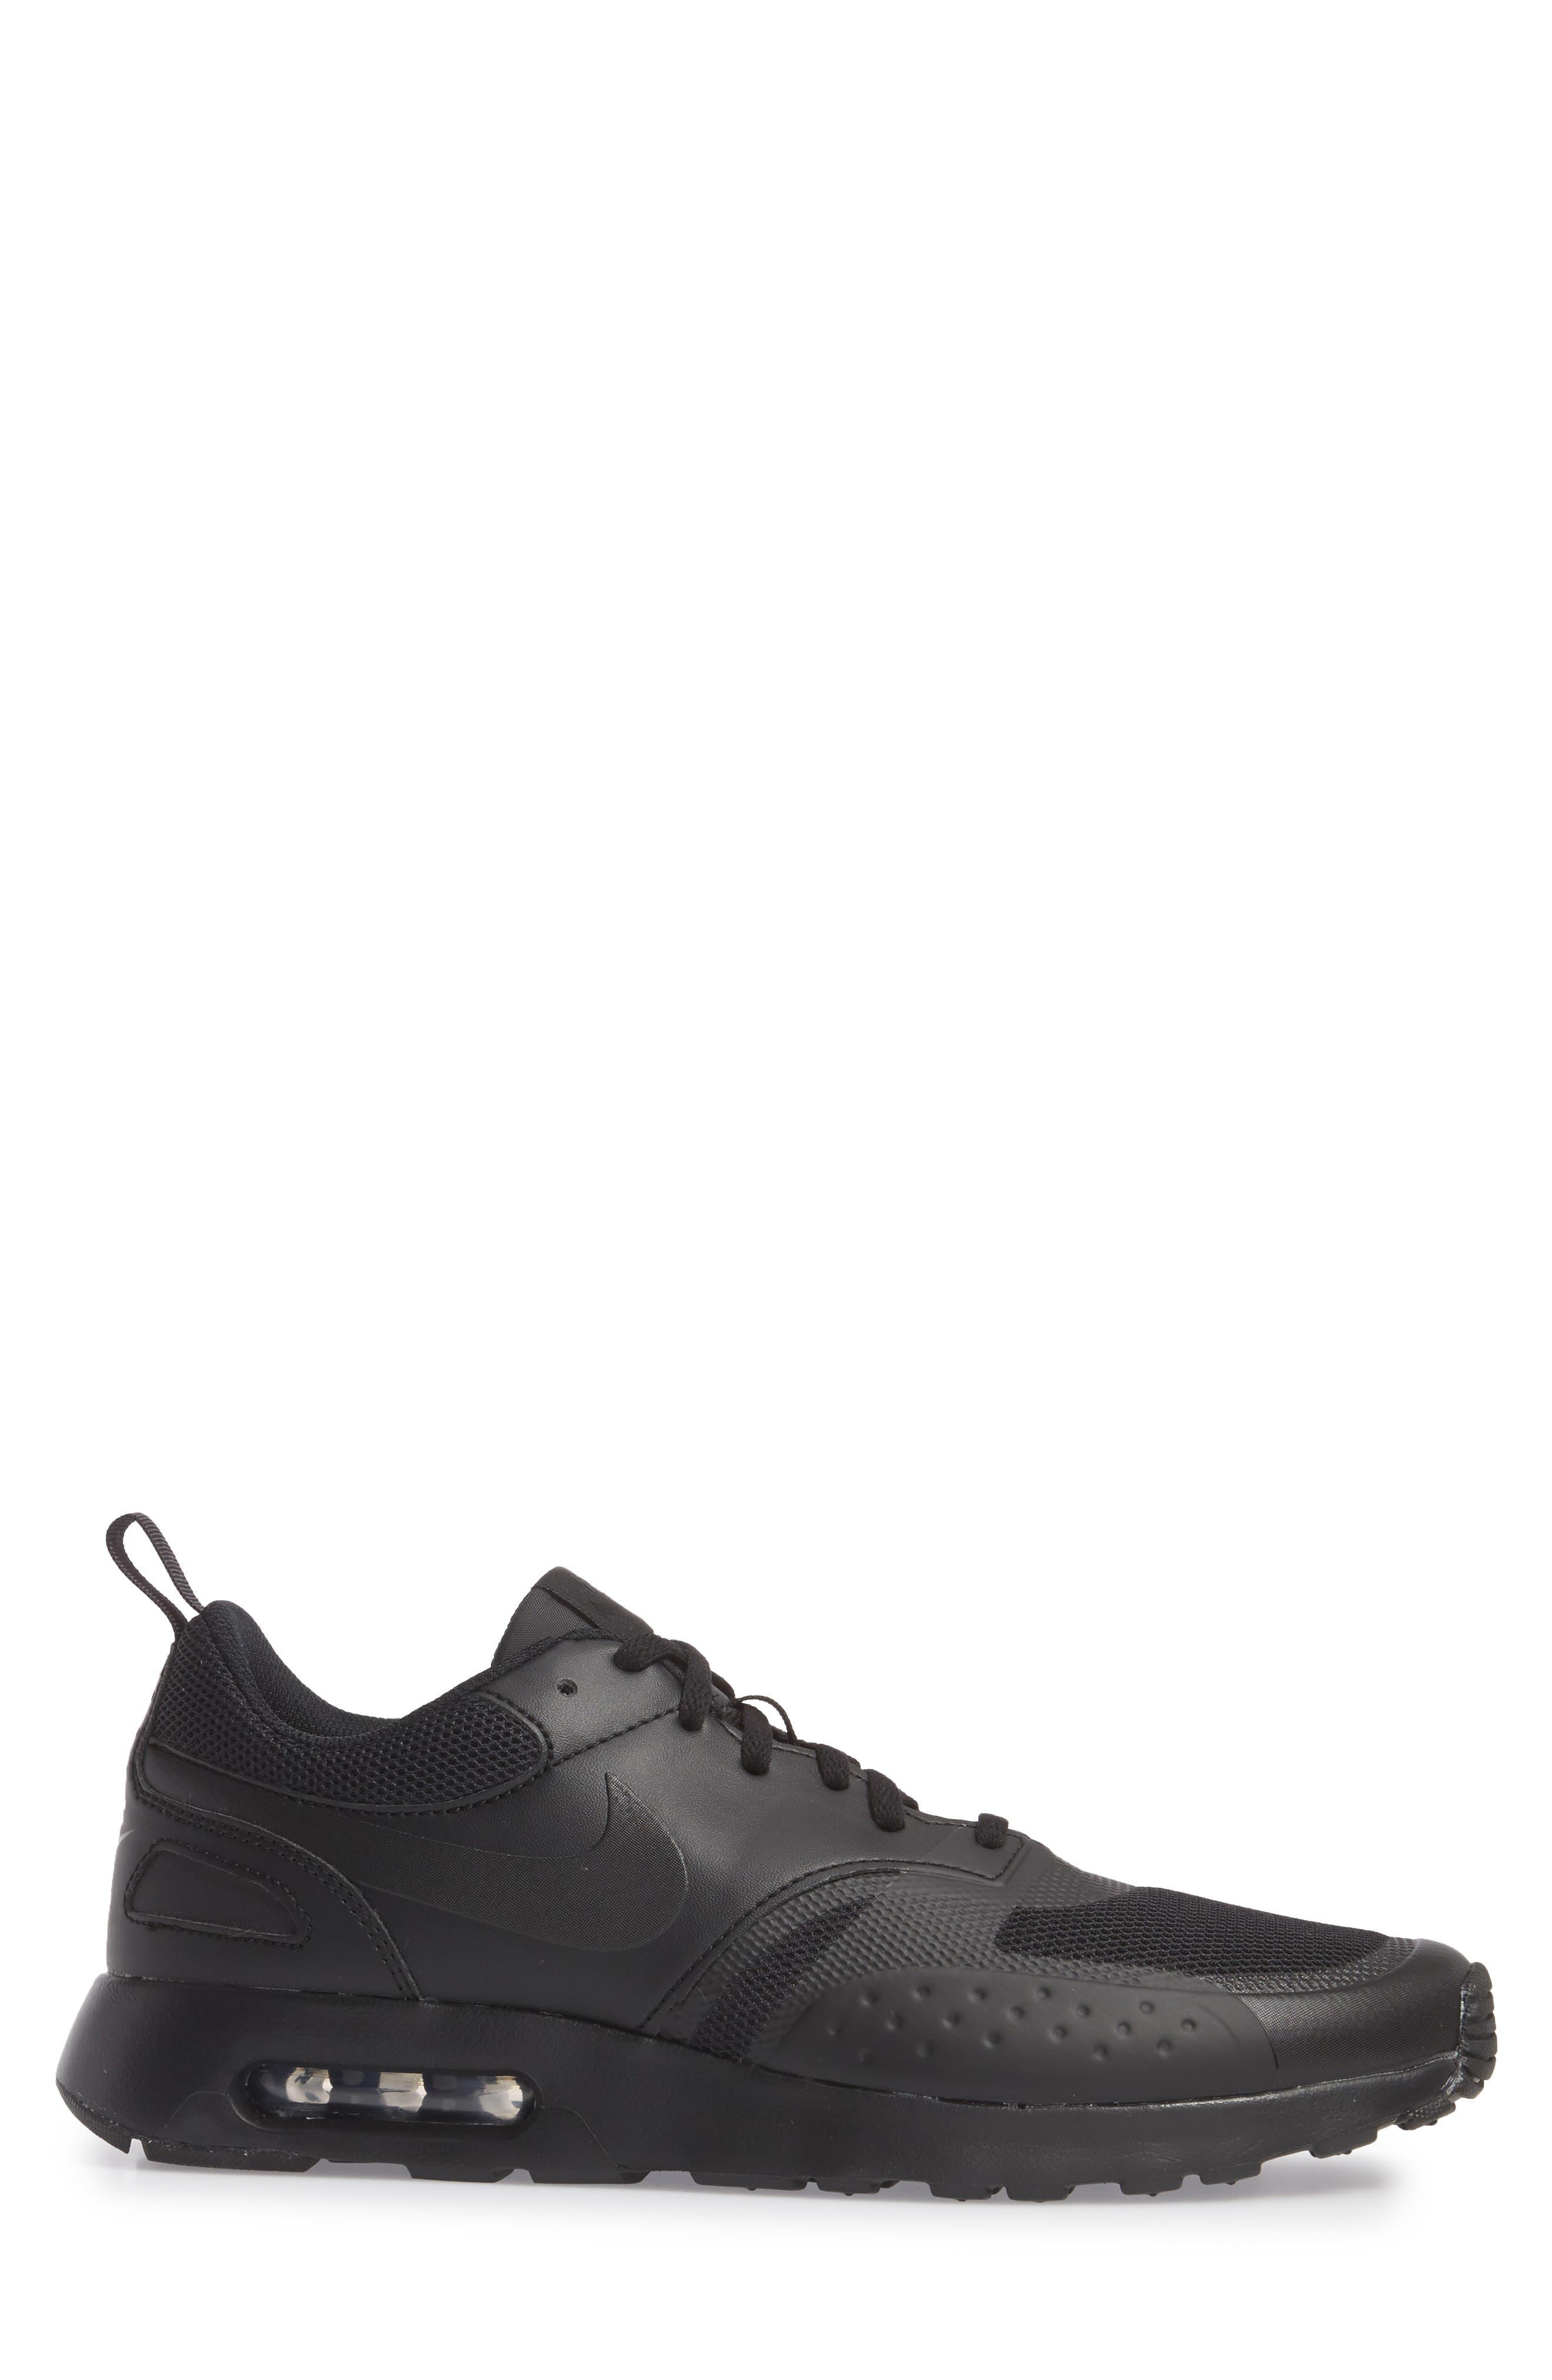 Air Max Vision Sneaker,                             Alternate thumbnail 3, color,                             BLACK/ BLACK